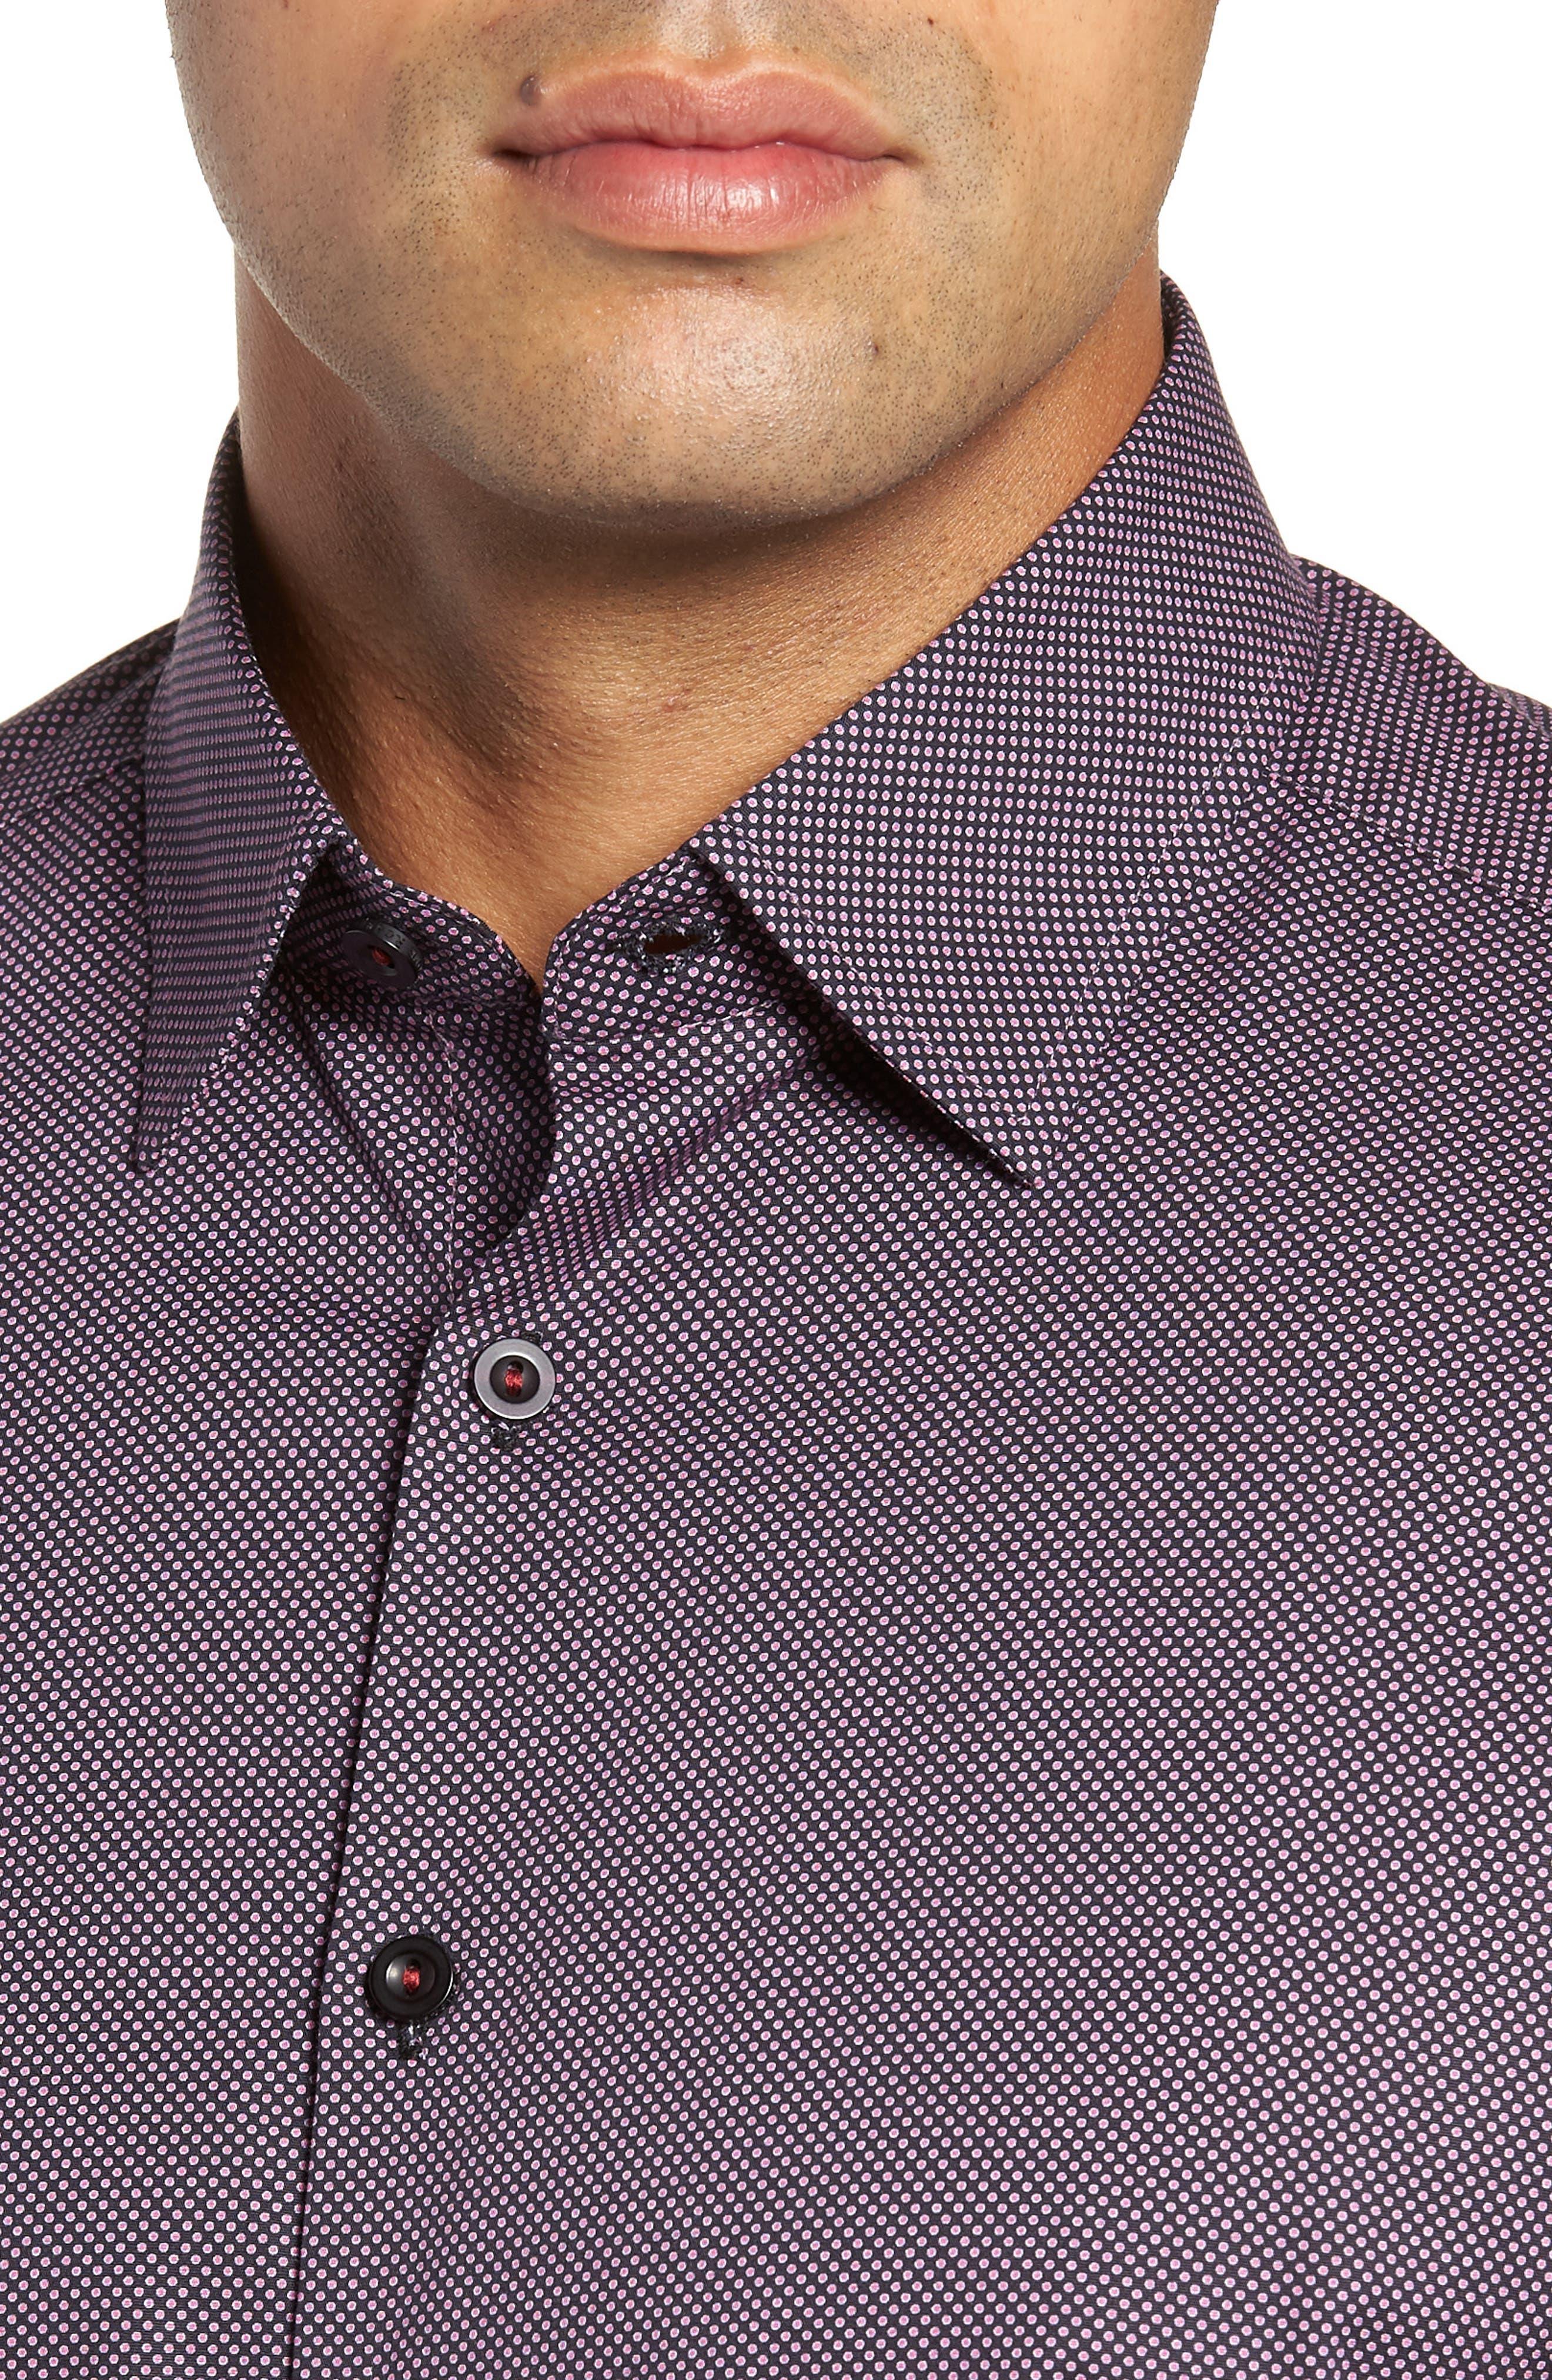 Regular Fit Microdot Sport Shirt,                             Alternate thumbnail 2, color,                             BLACK